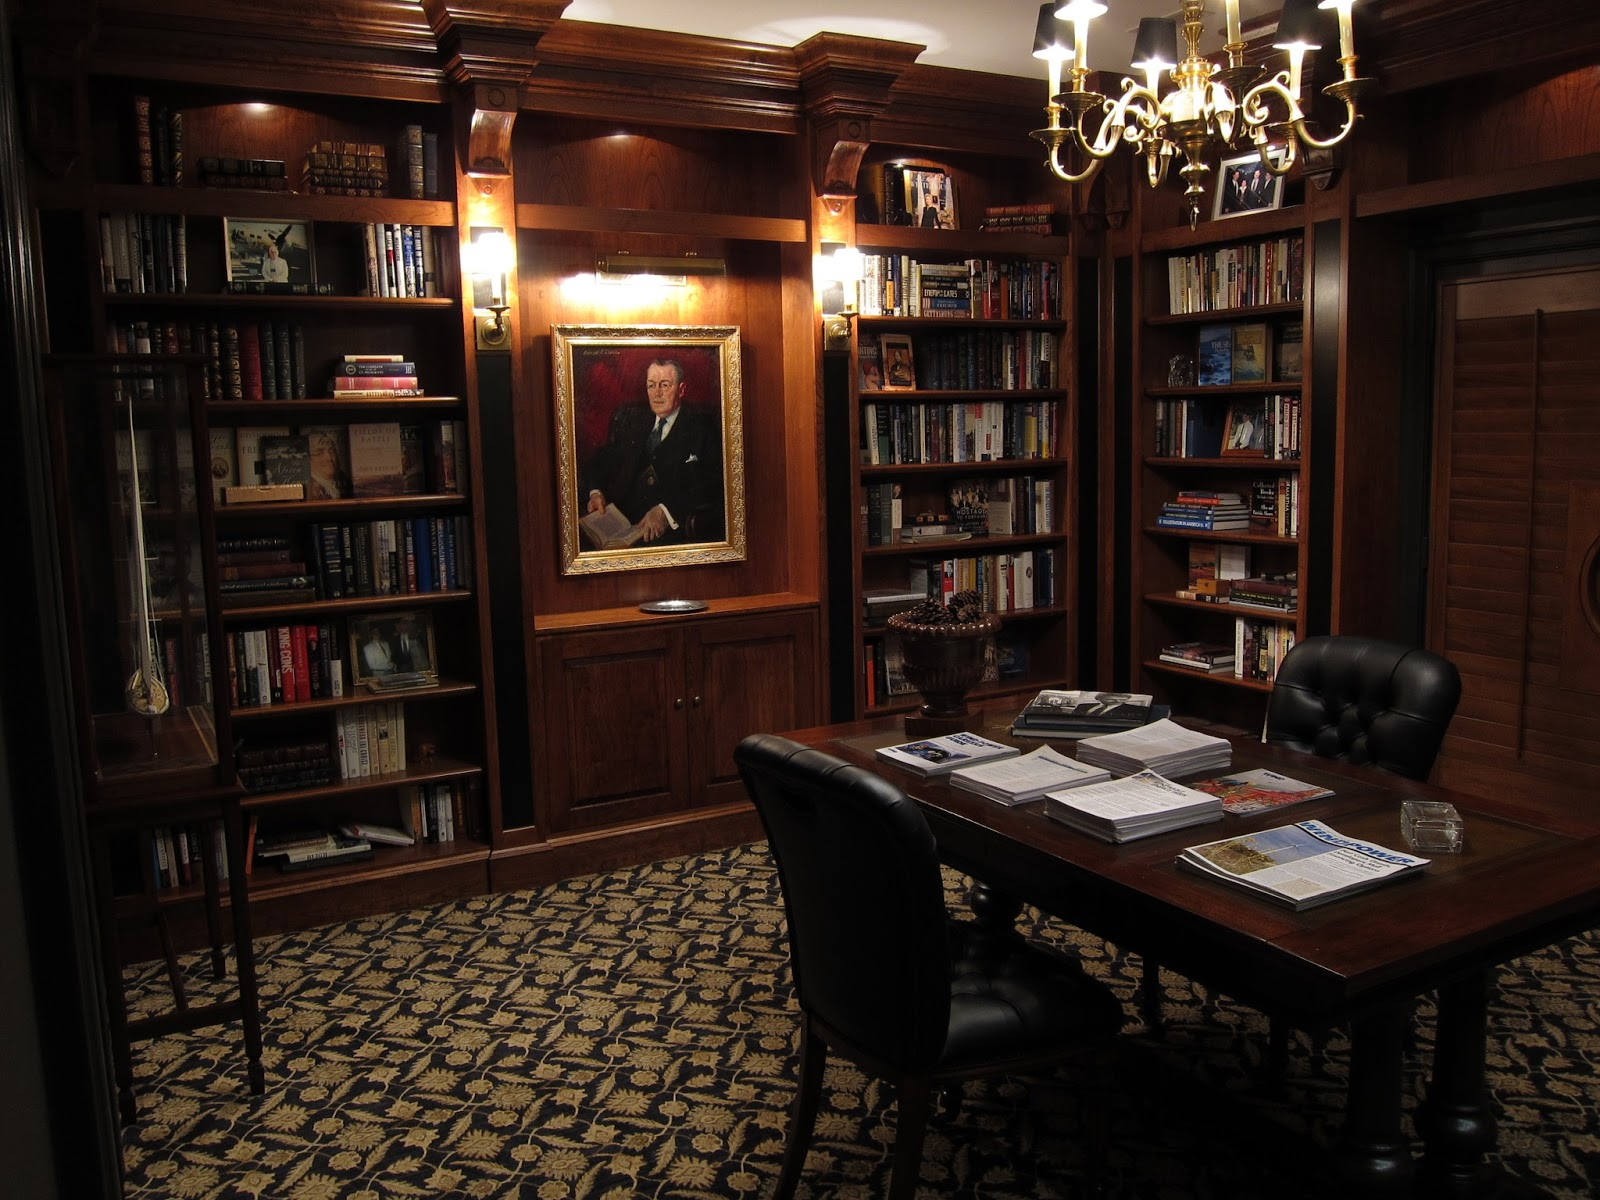 Man Cave Library Ideas : Intellectual man cave art resource boston